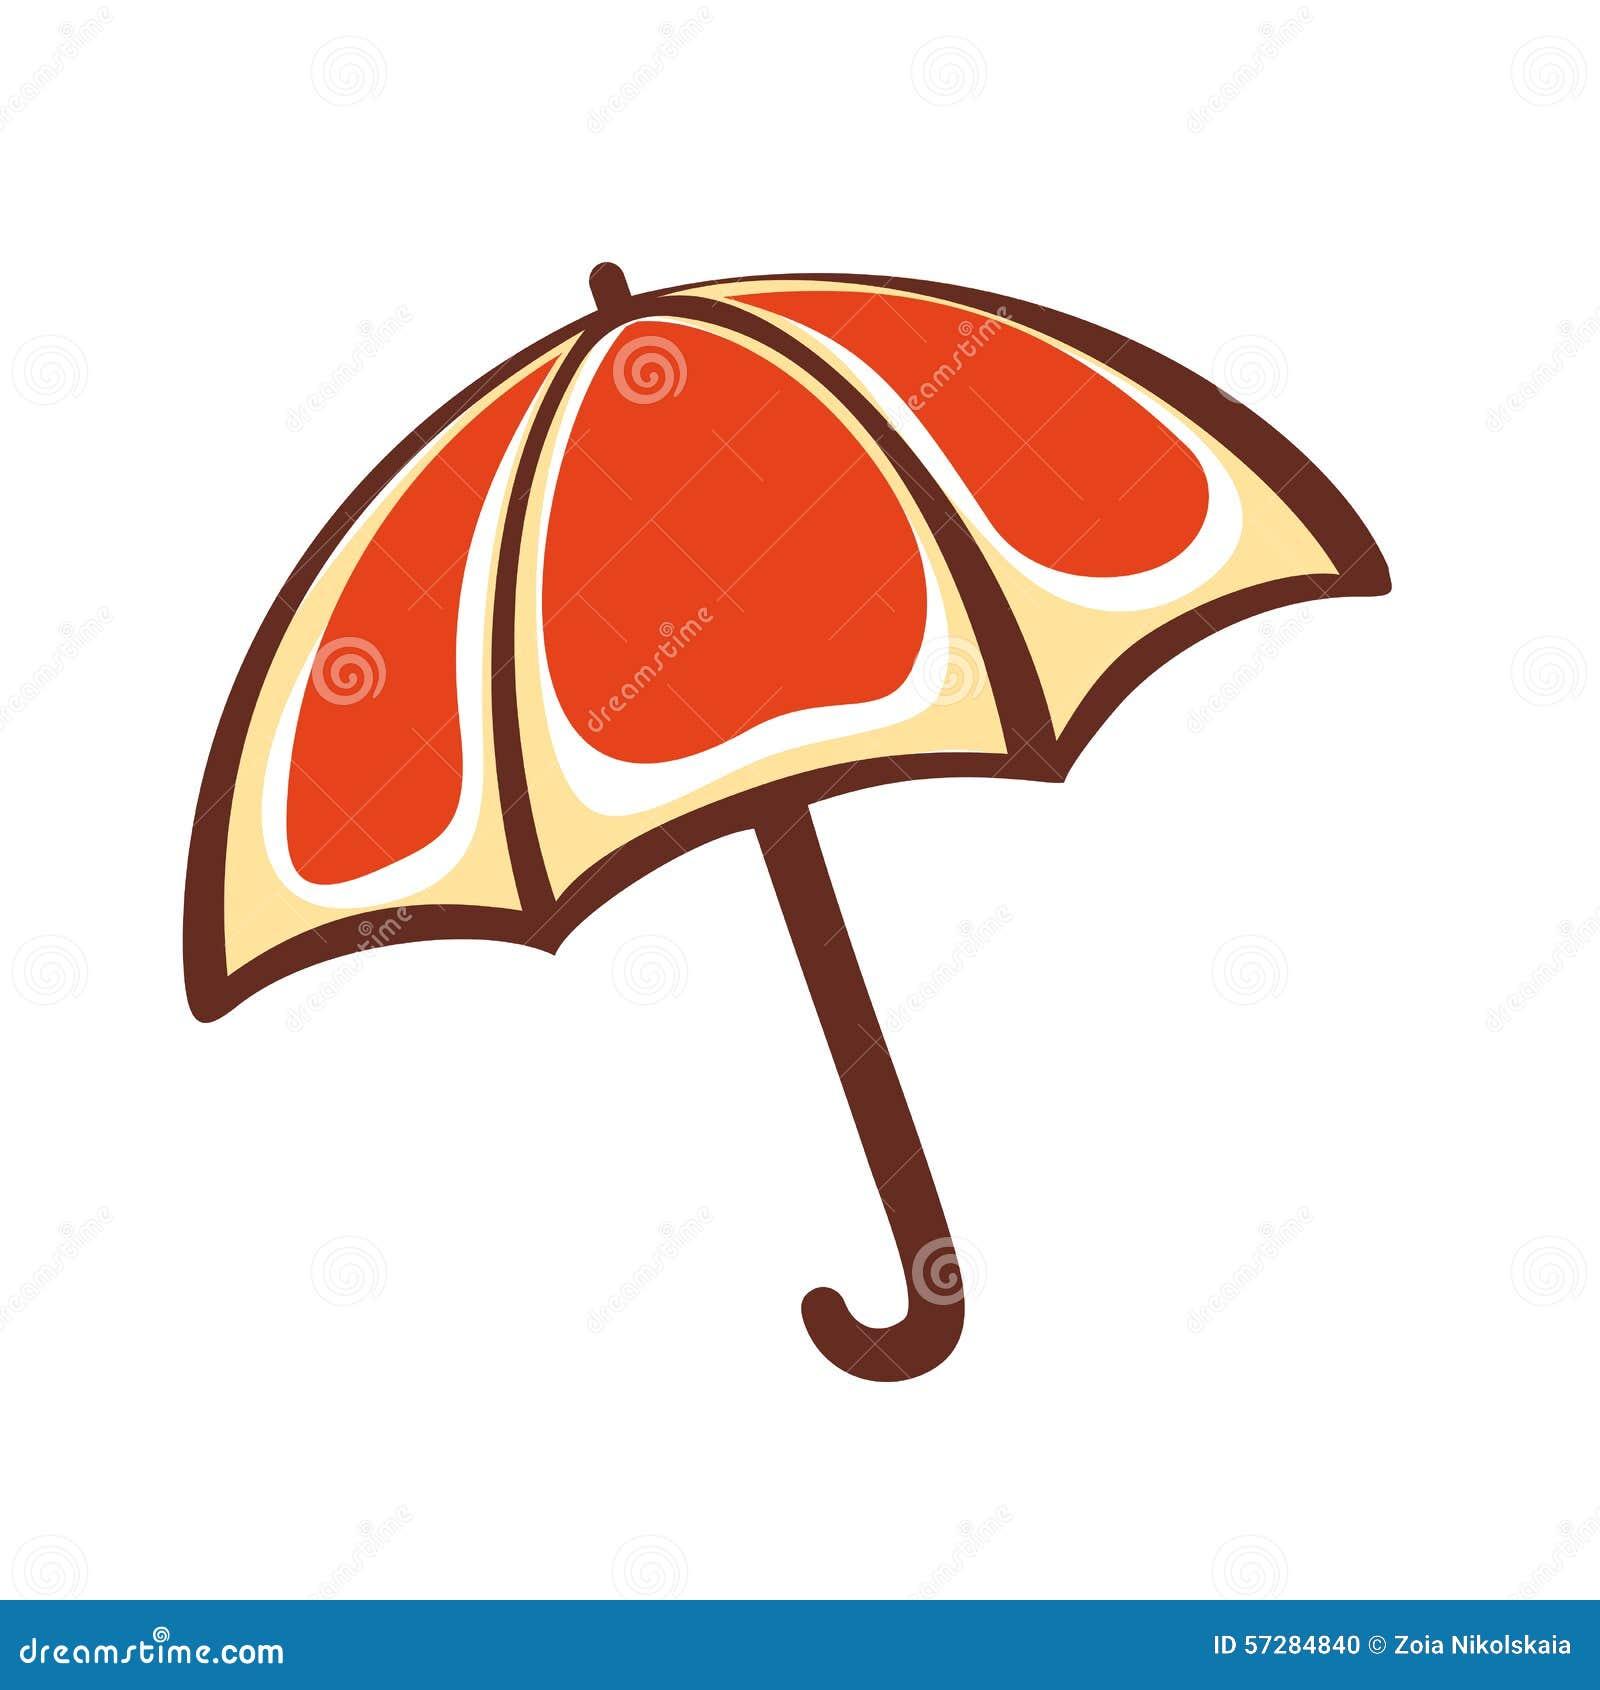 Orange Regenschirm emblem pictogram ikone